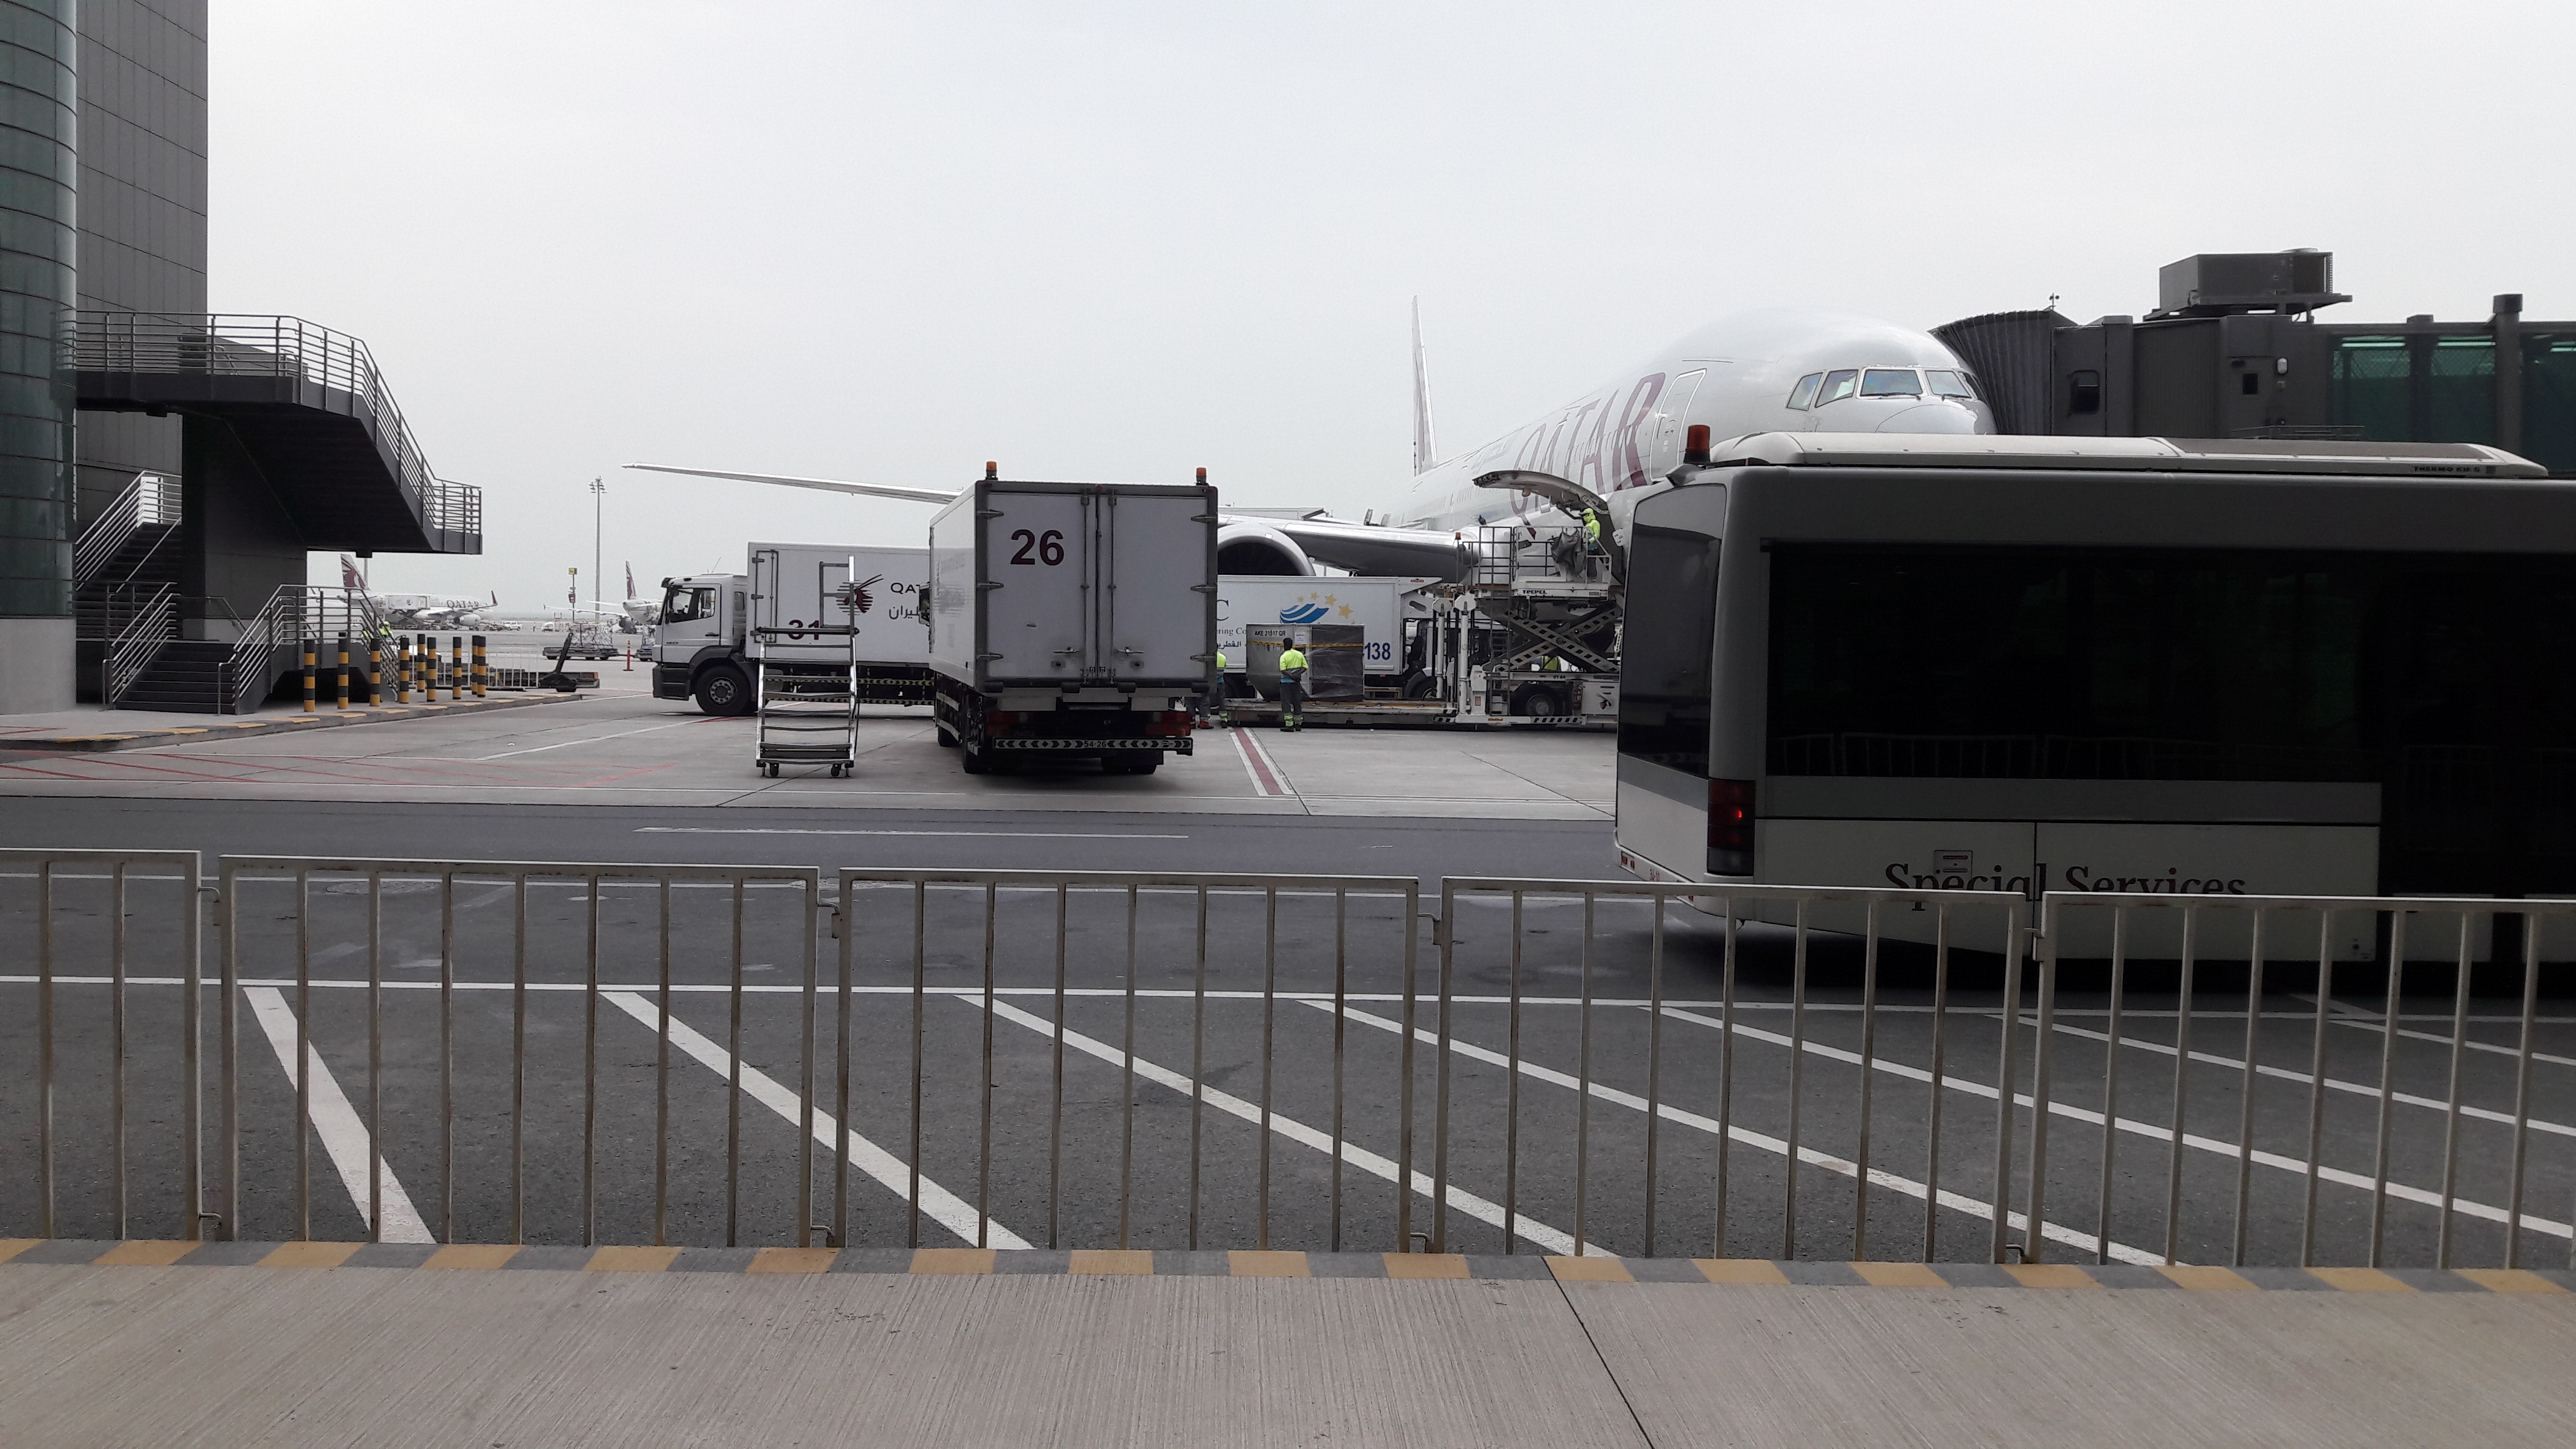 doha-qatar-airport-public-inside-bus-apr18